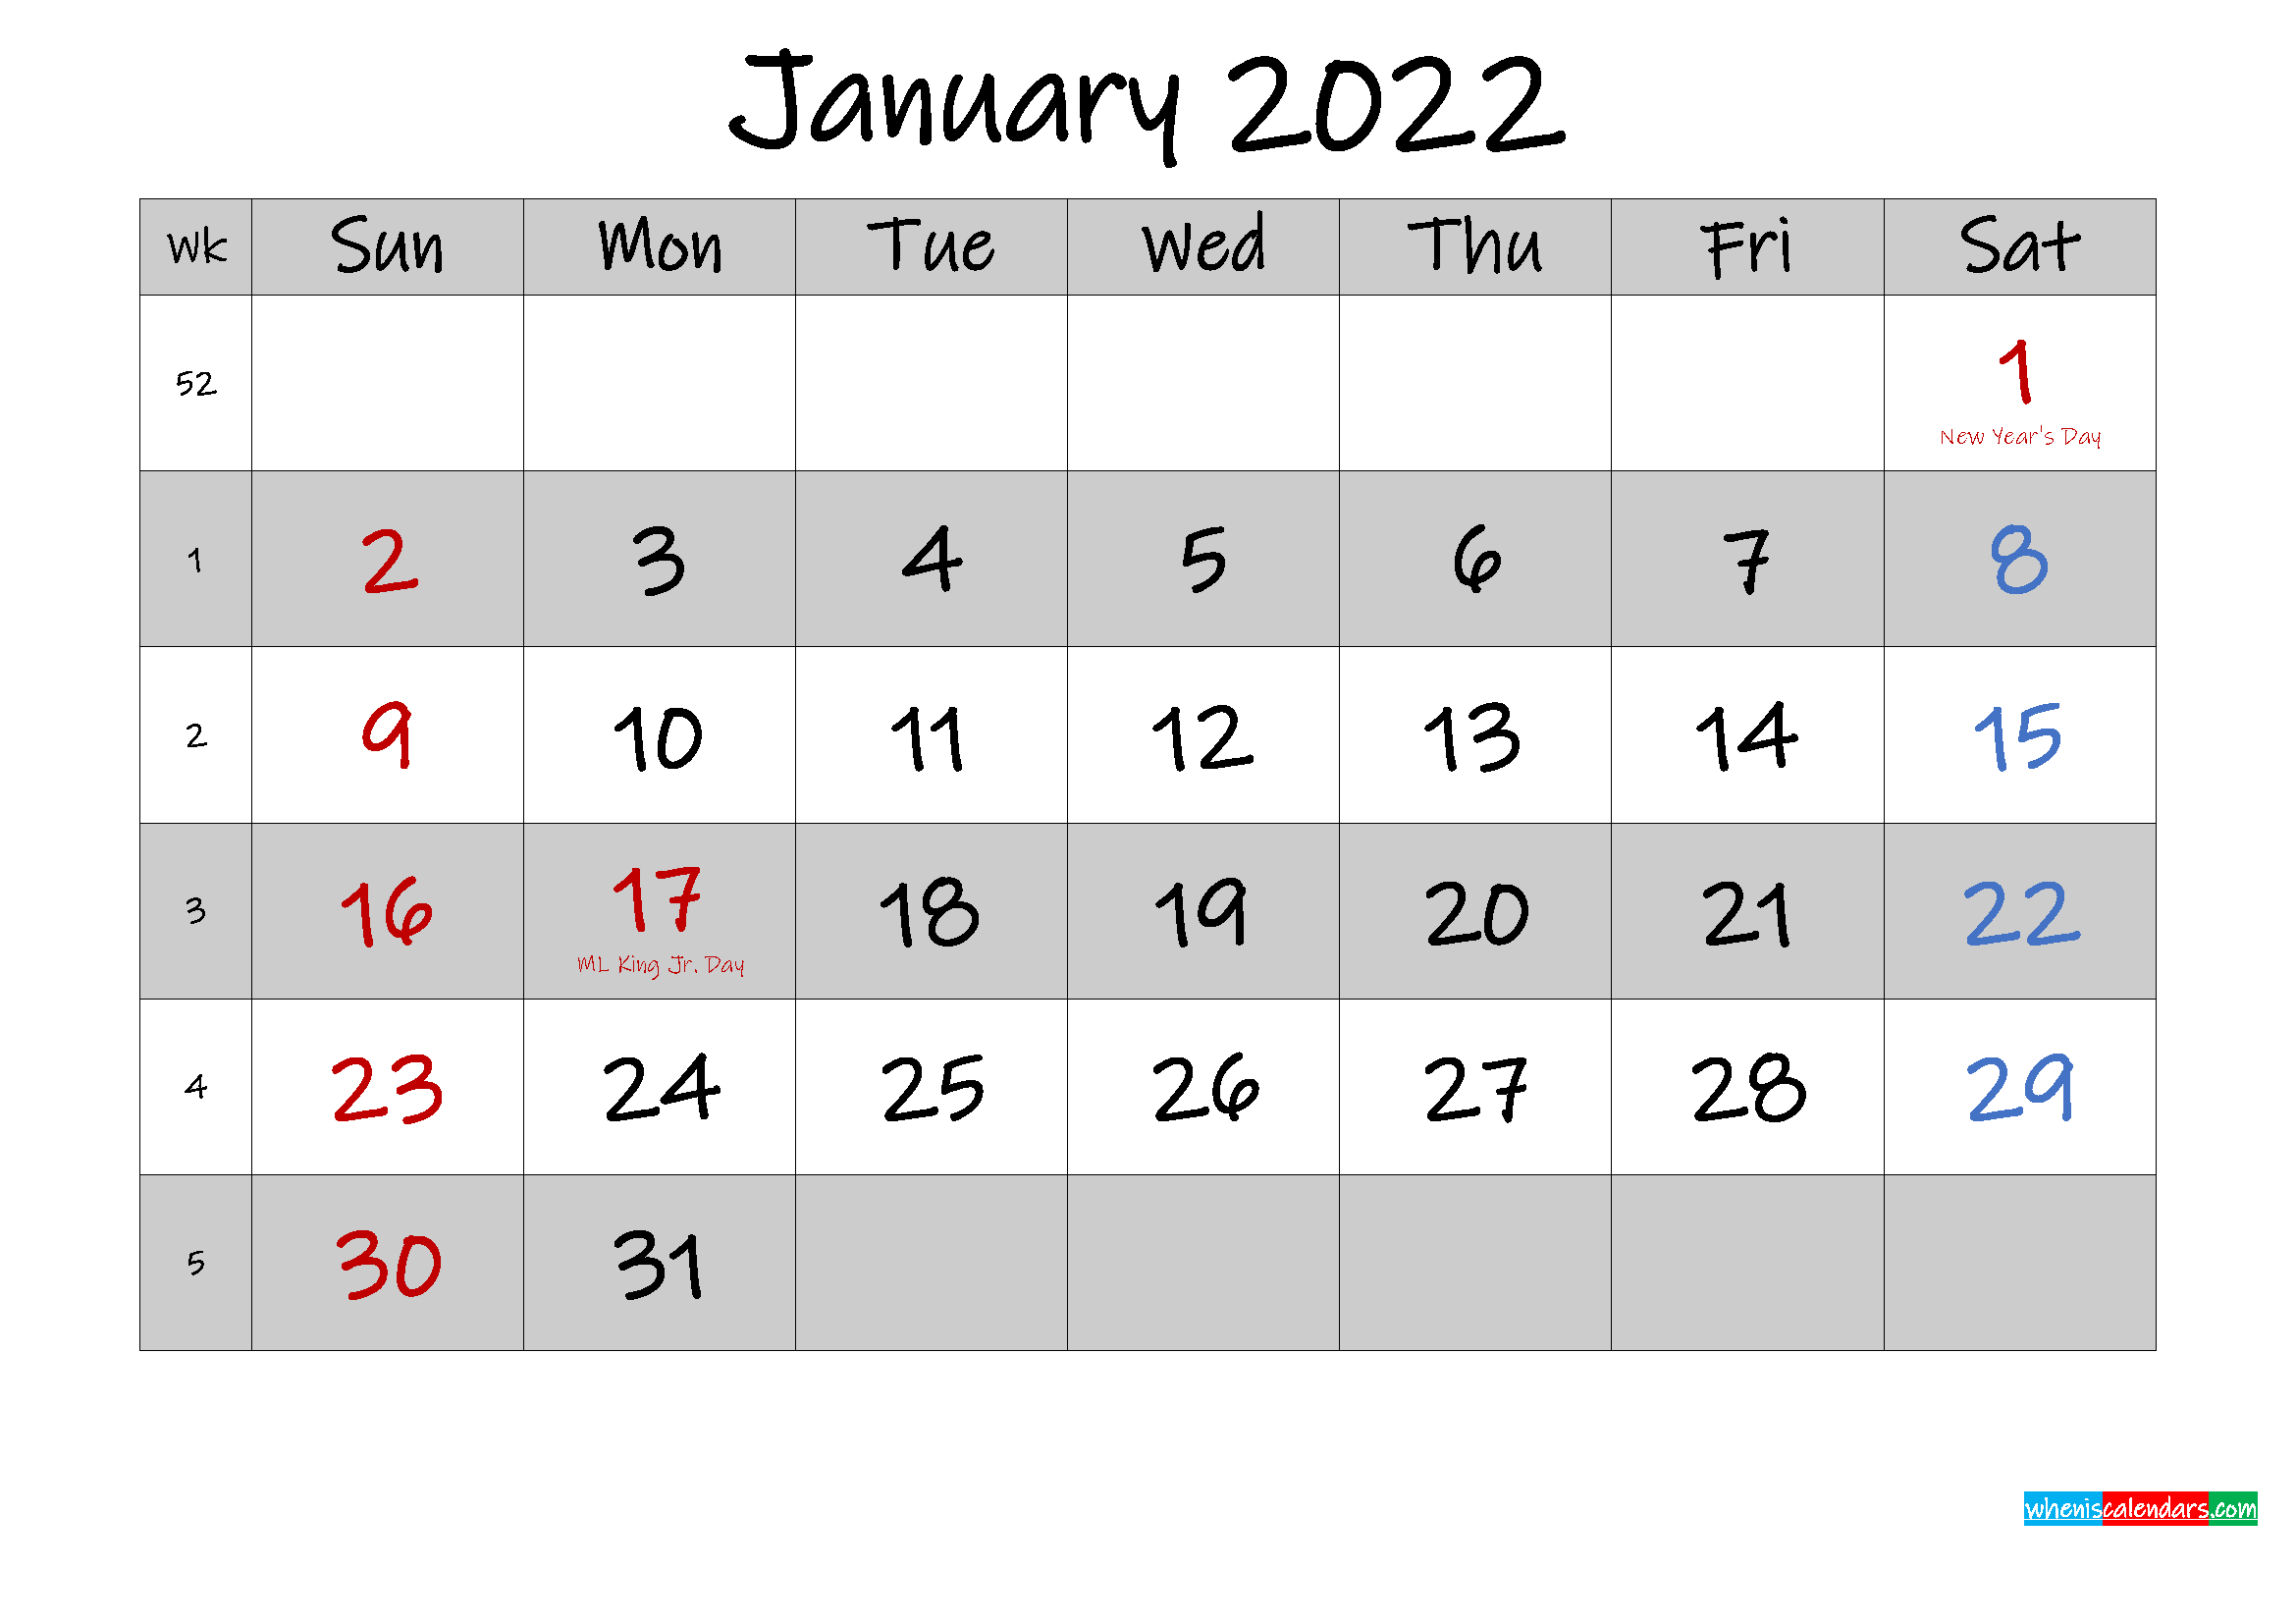 Free Printable January 2022 Calendar With Holidays In Blank Calendar January 2022 Printable